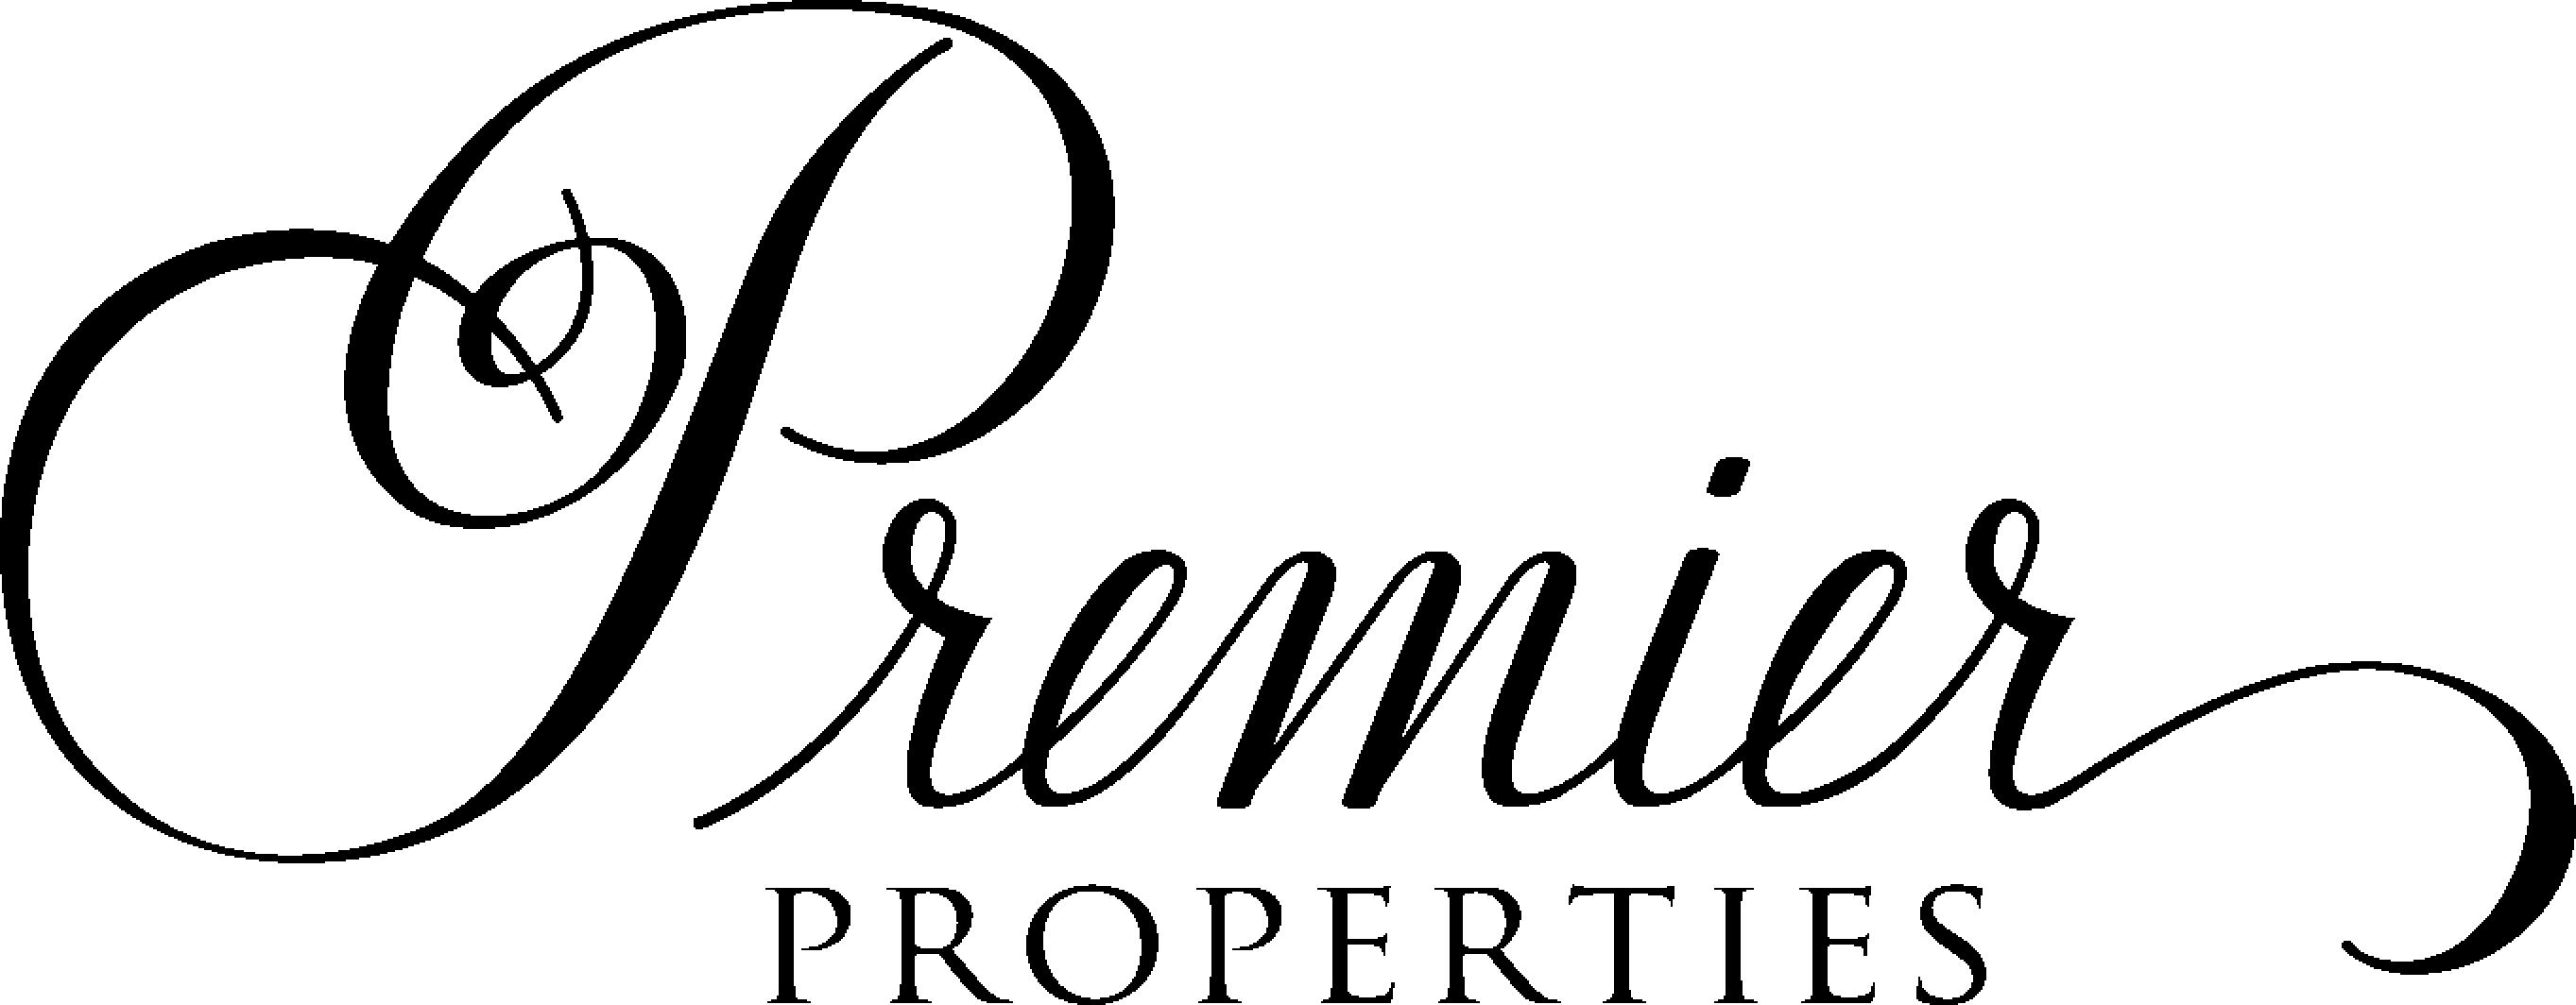 PremierProperties